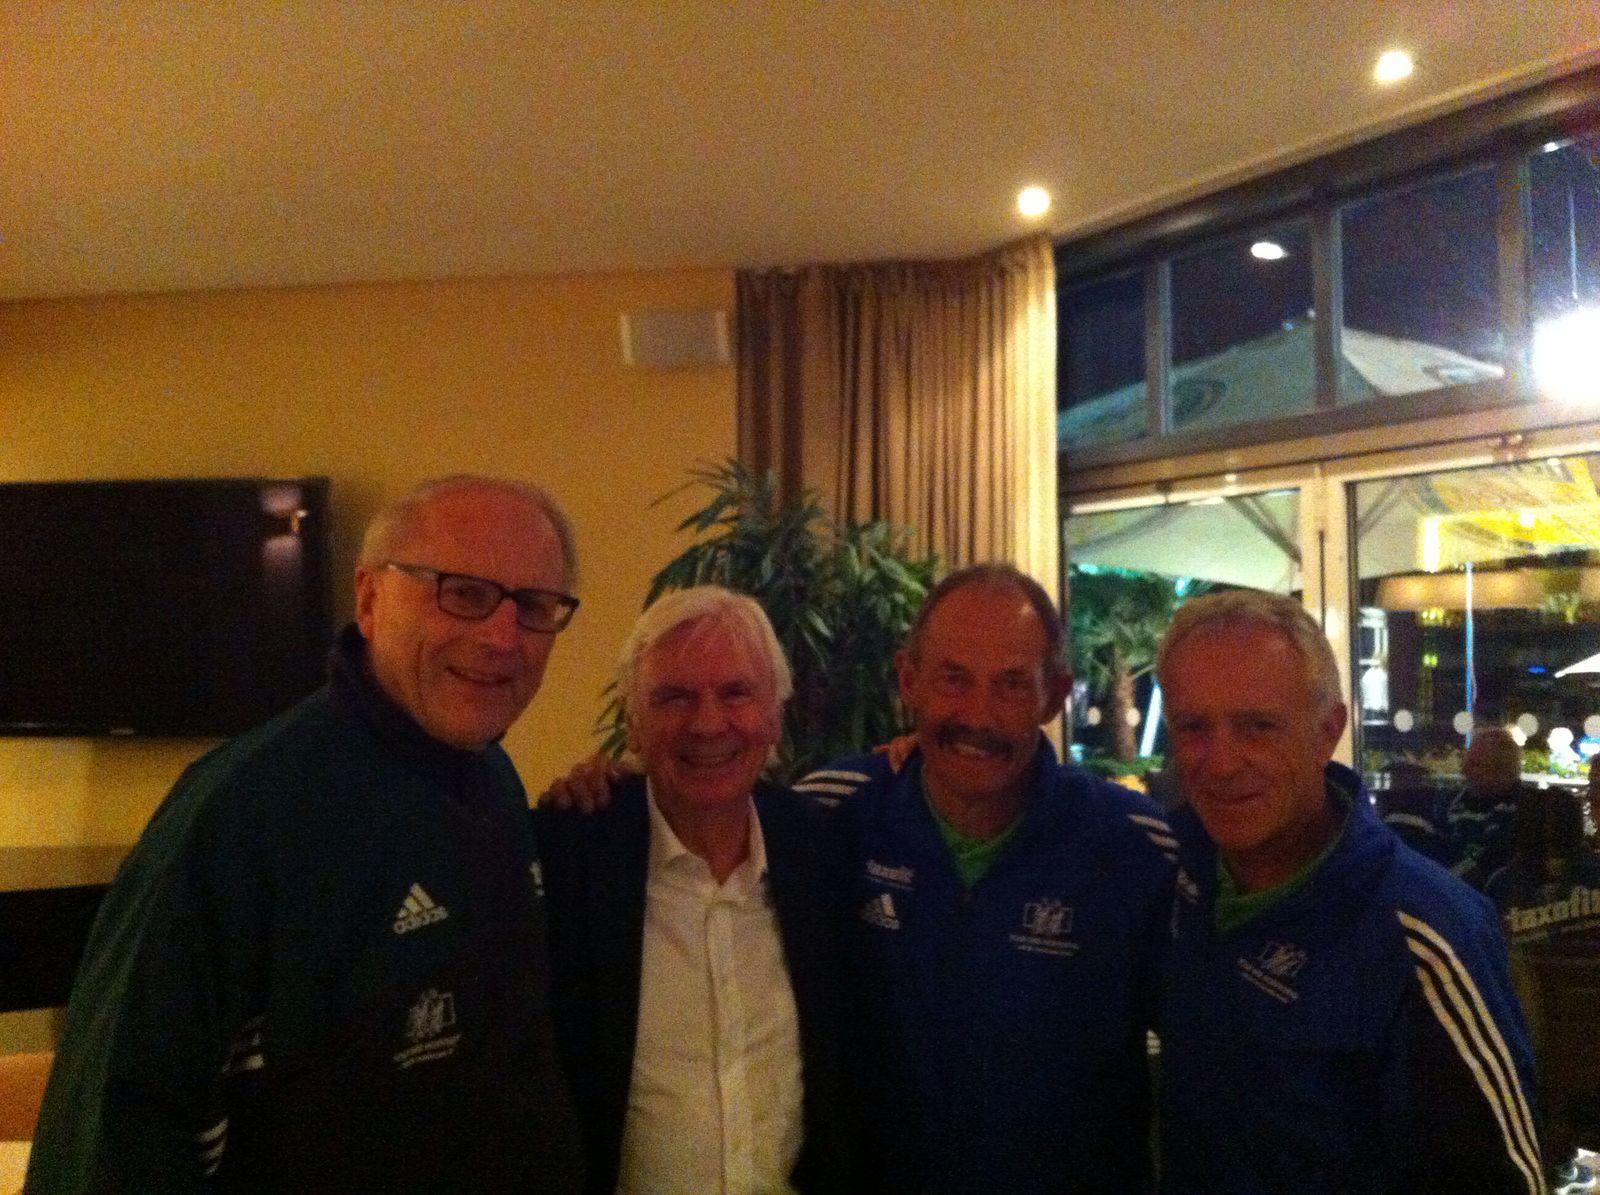 Herbert Watterott, Dieter Kürten, Alois Stöcklin, Klaus-Peter Thaler